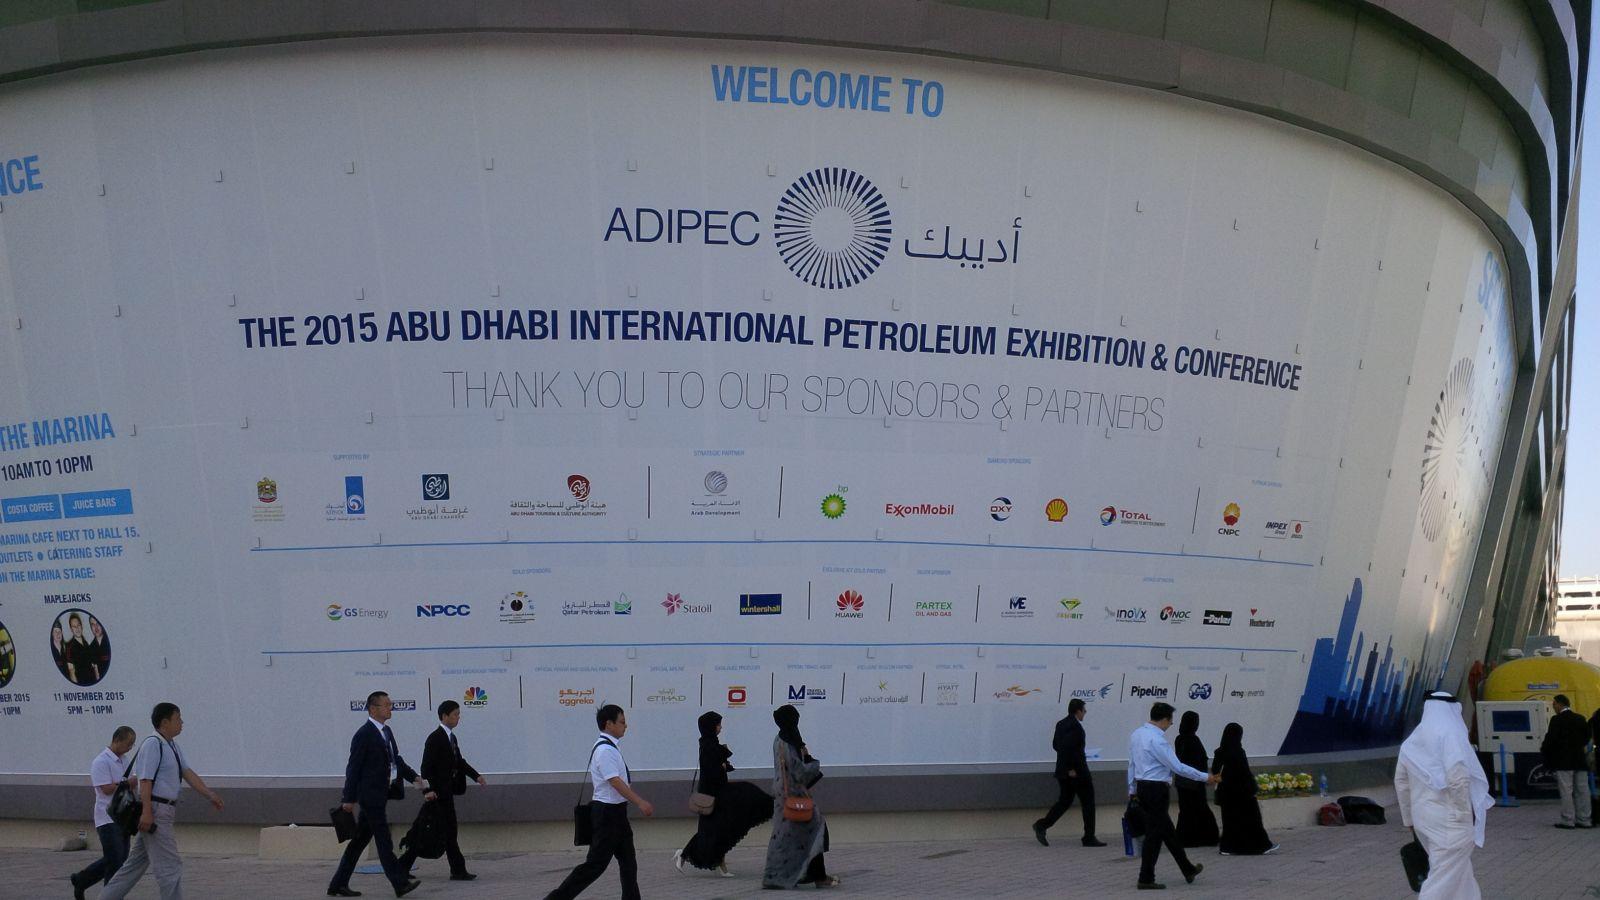 ADIPEC Expo 2015